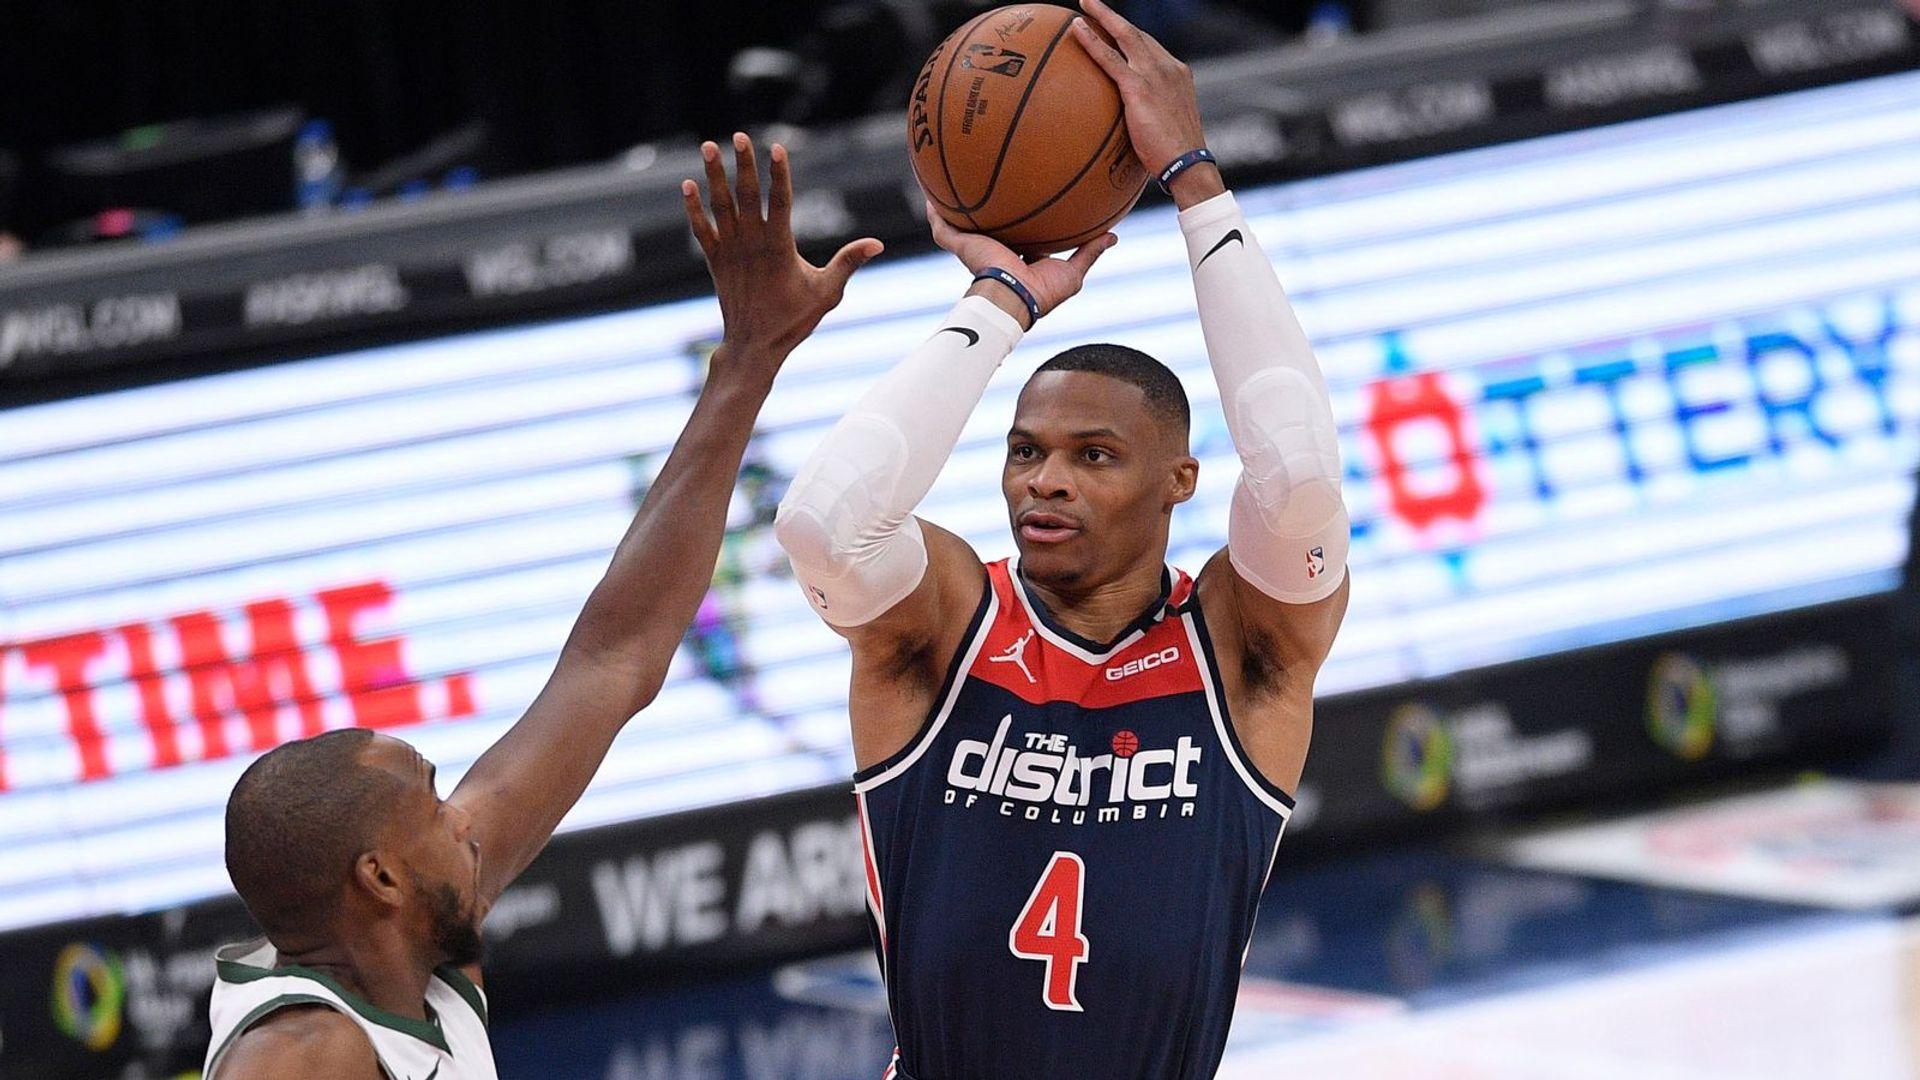 NBA's Worst Defenses Duel in D.C. as Wizards Host Kings